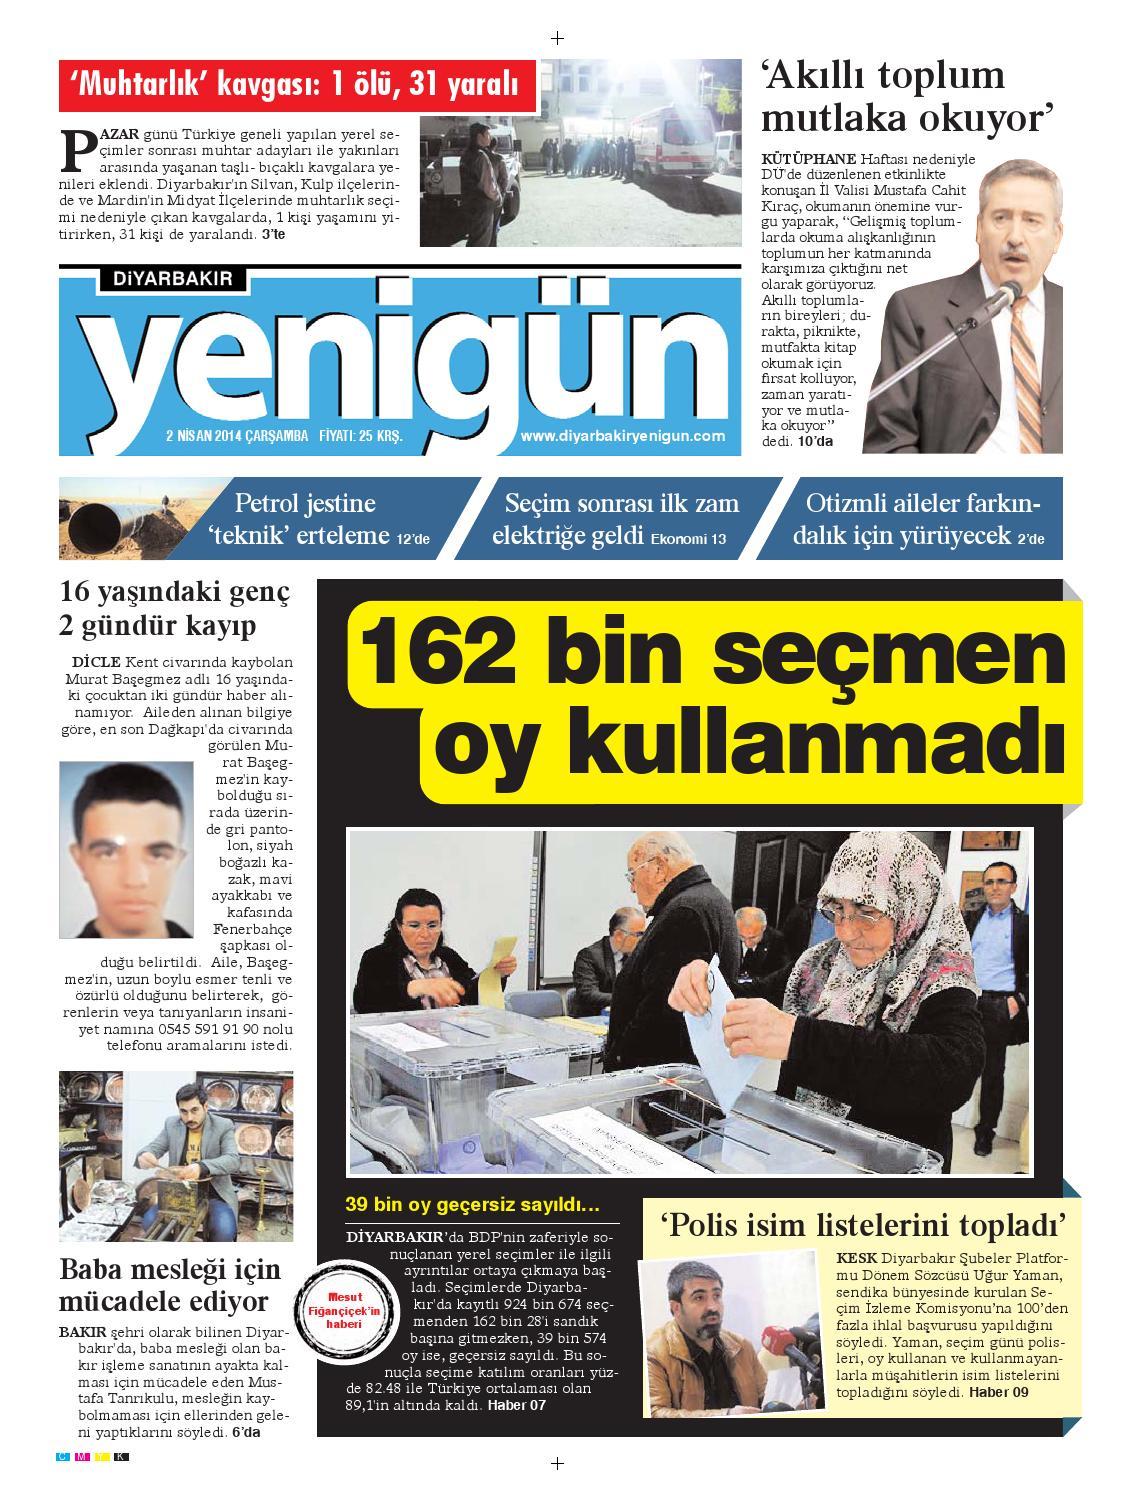 Diyarbakir Yenigun Gazetesi 2 Nisan 2014 By Osman Ergun Issuu